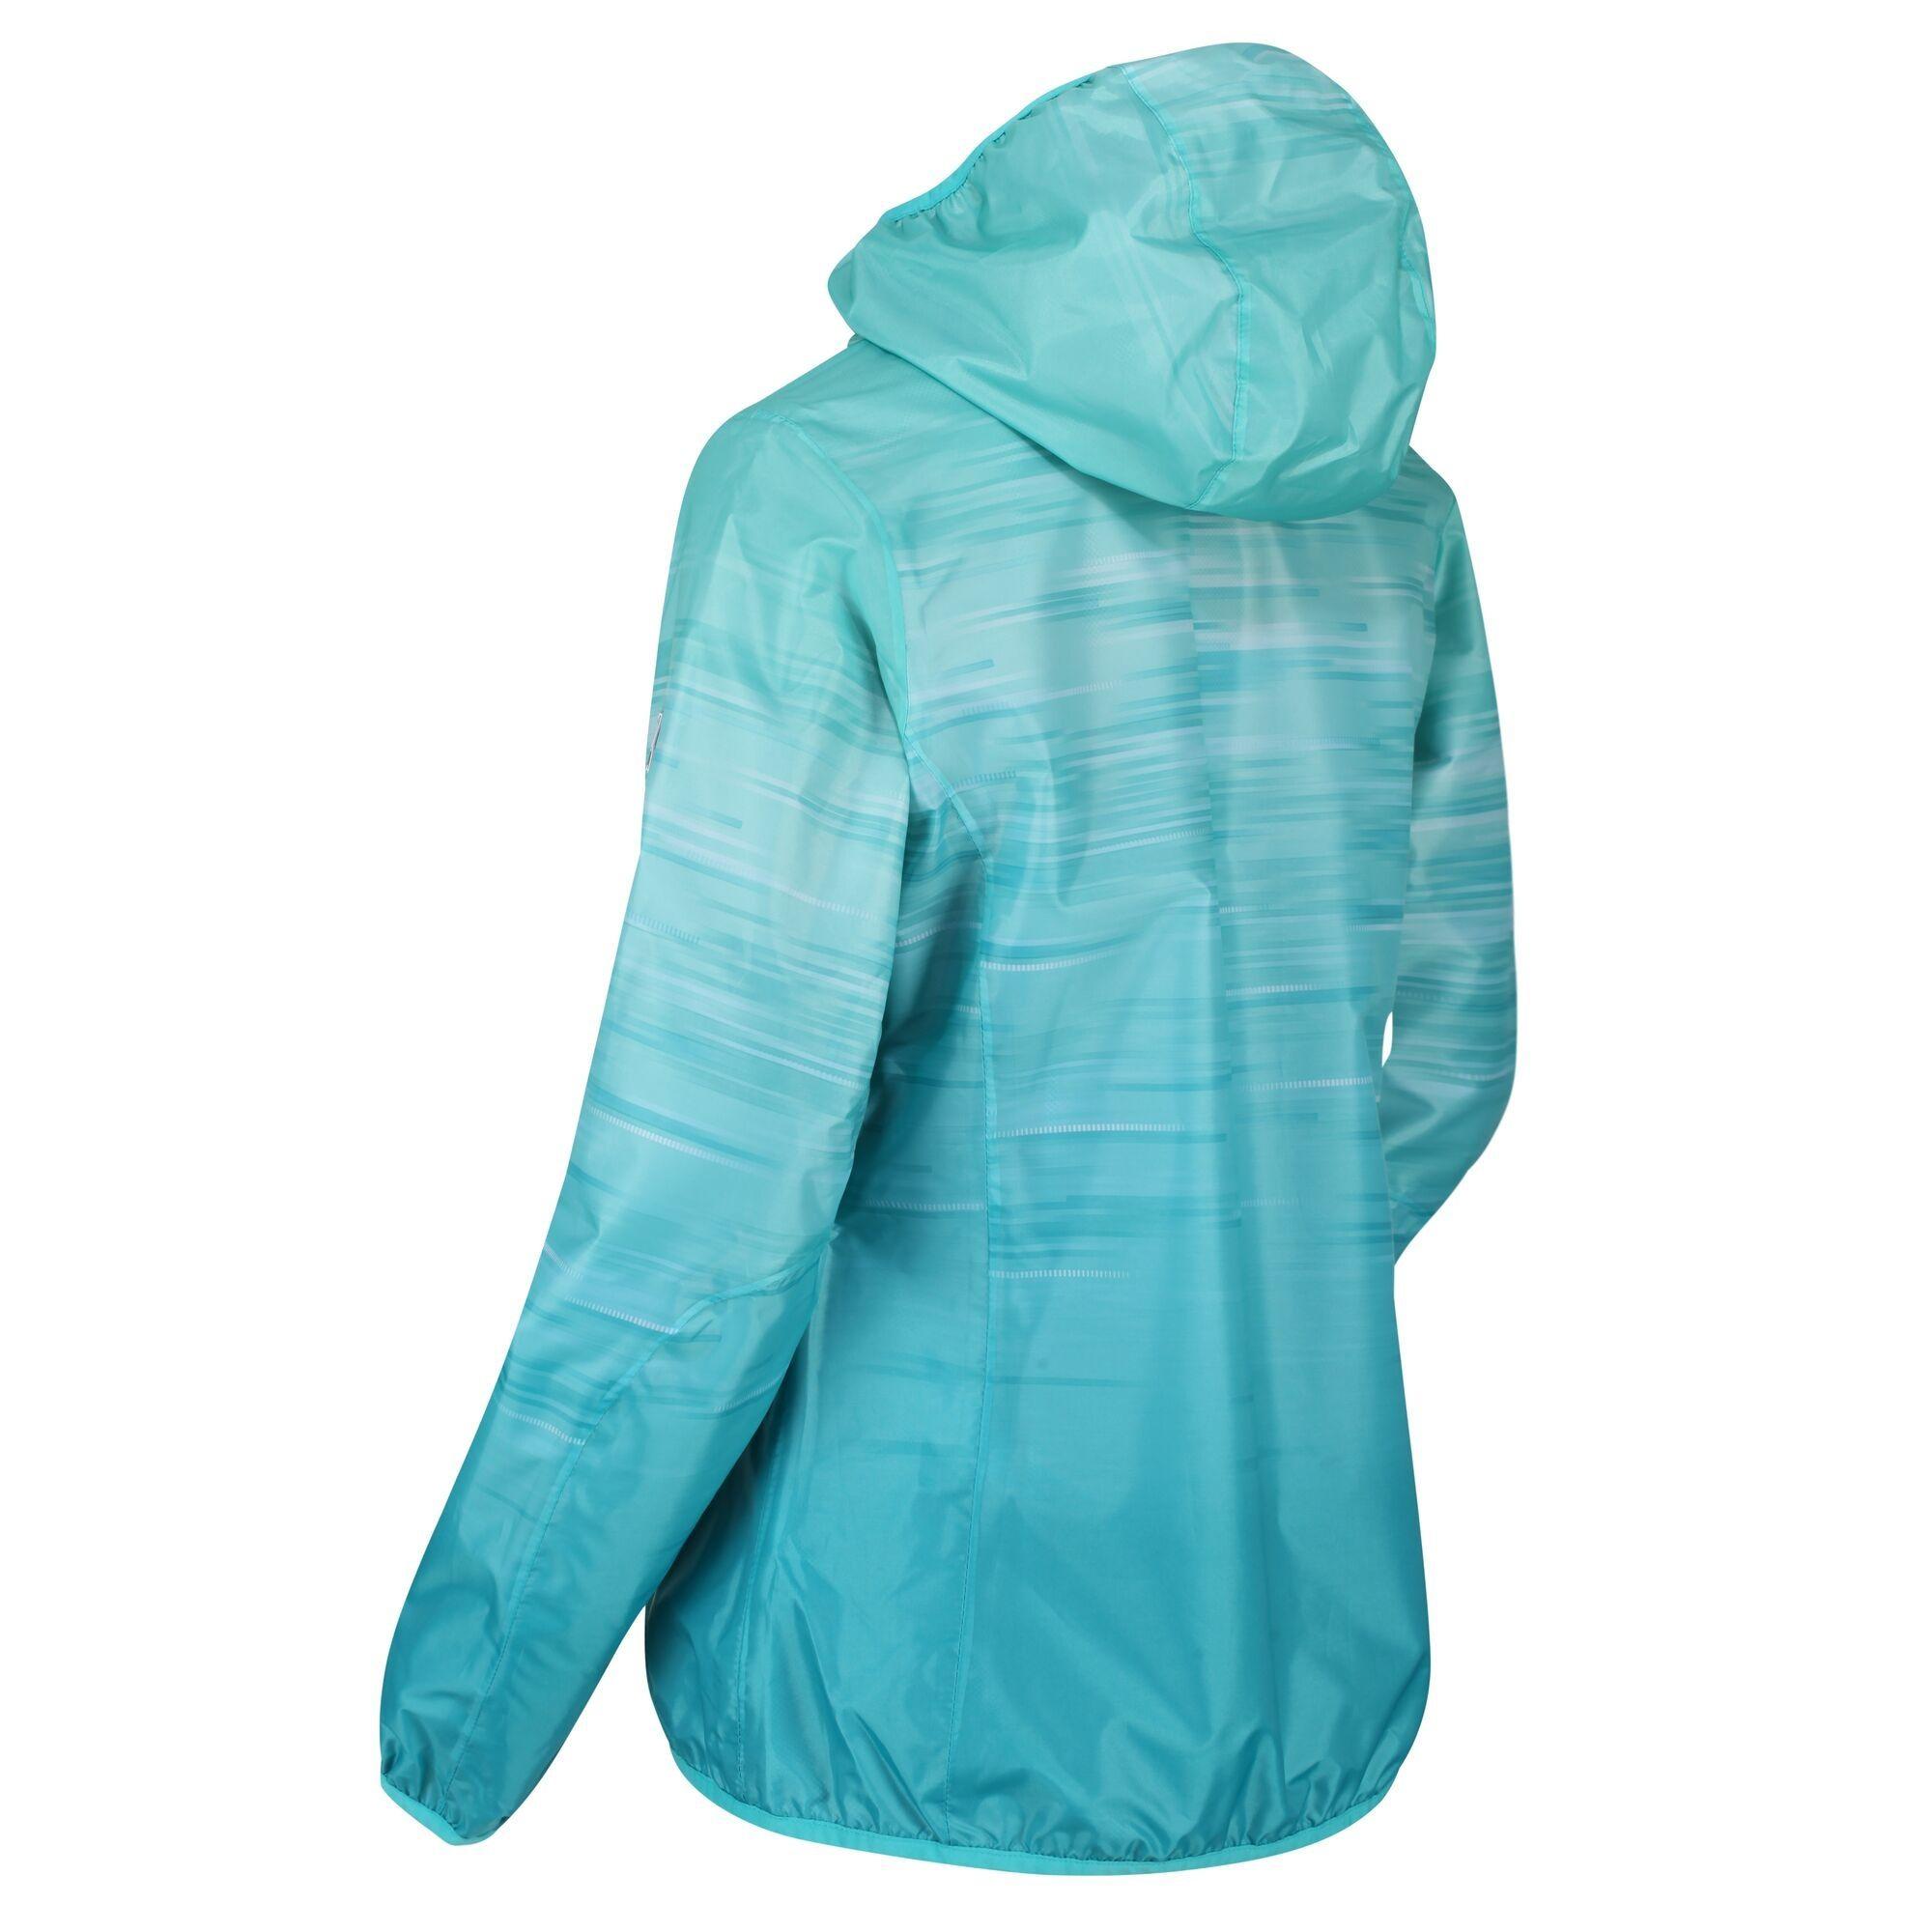 Regatta Women's Leera IV Lightweight Waterproof Jacket